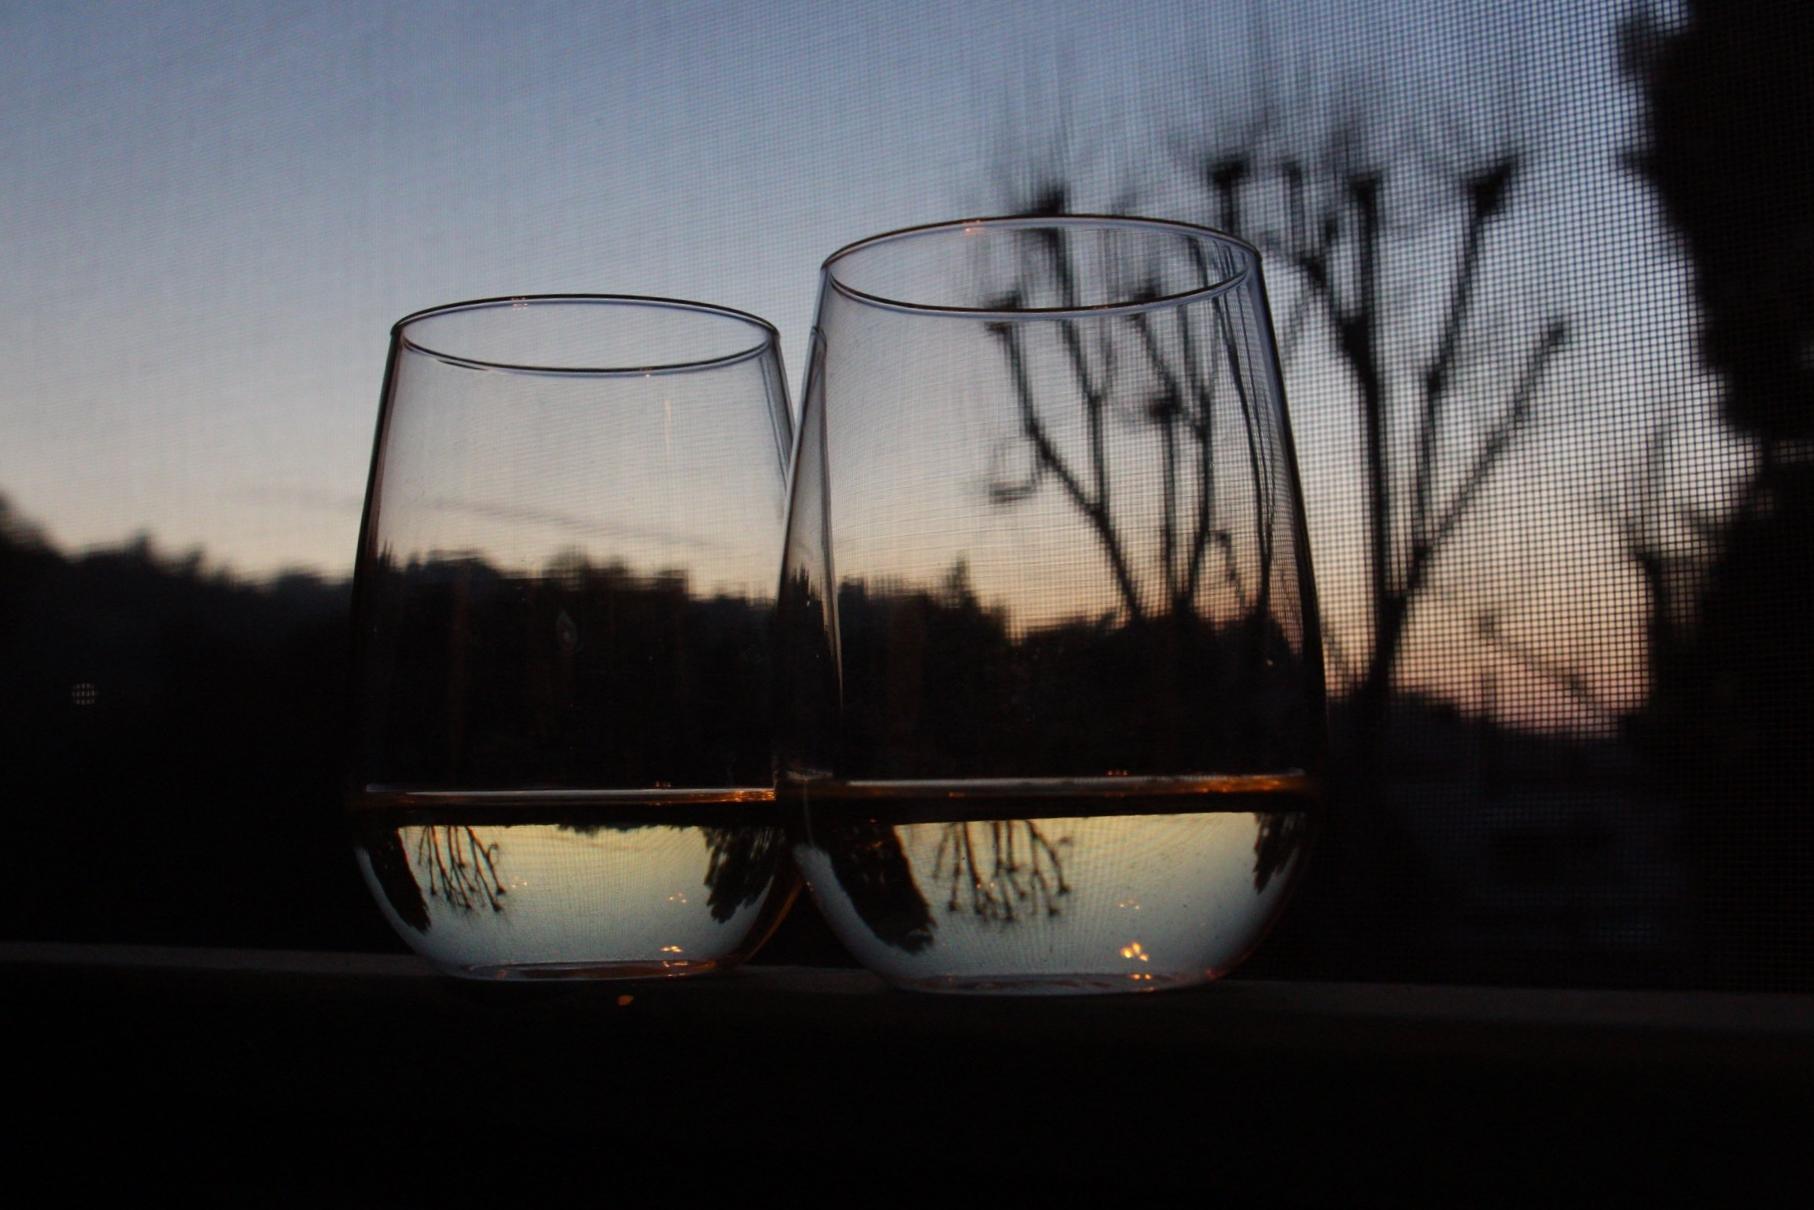 the wine idiot trader joe's wine reviews contadino pinot grigio 2014 villa cerrina chardonnay pinot grigio 2014